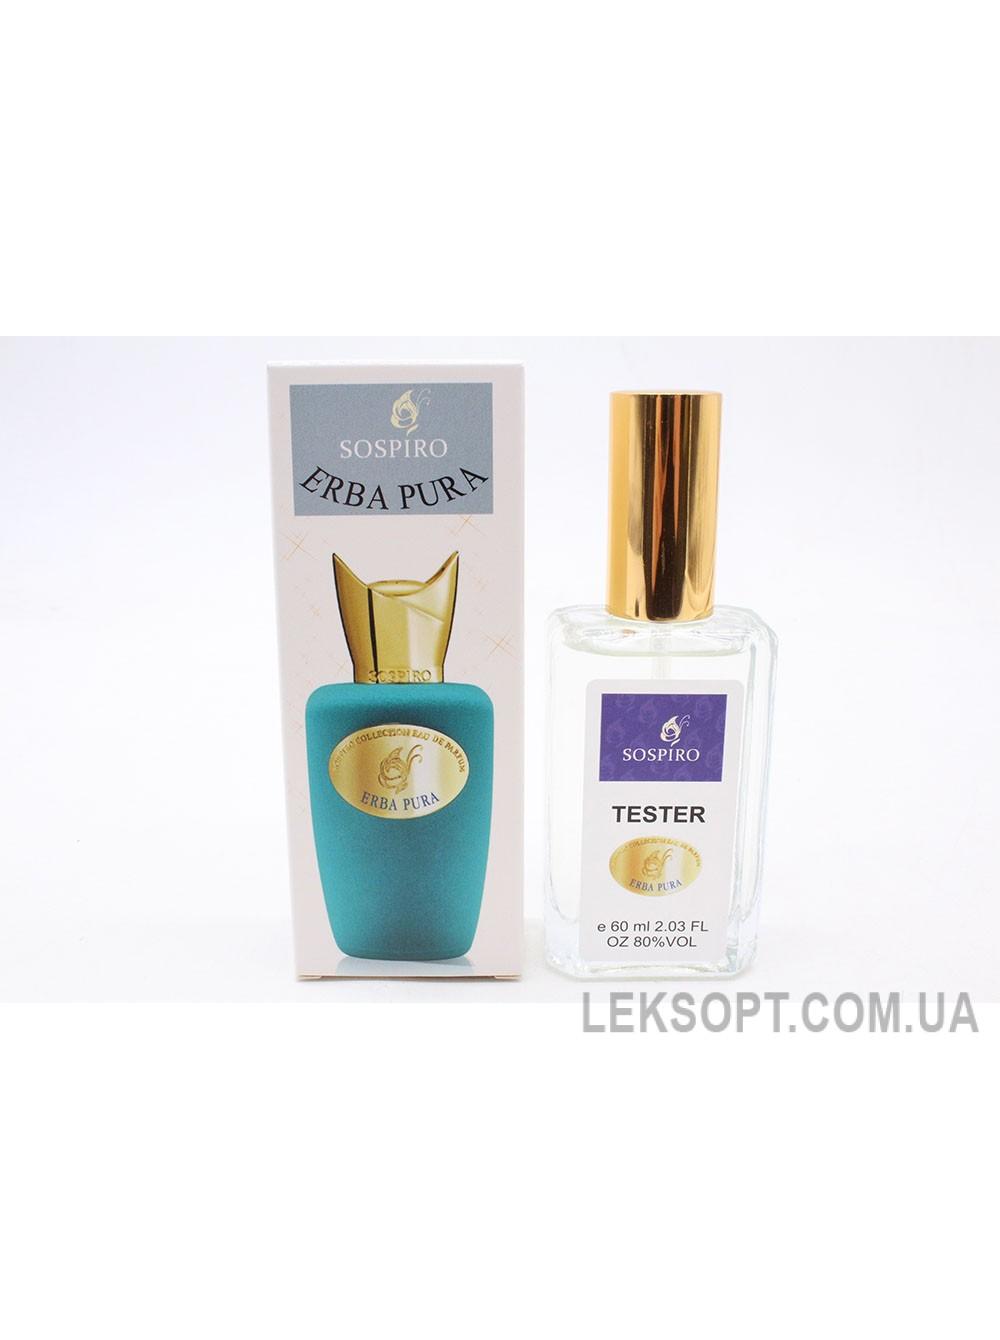 Женский парфюм тестер: Erba pura sospiro 60мл